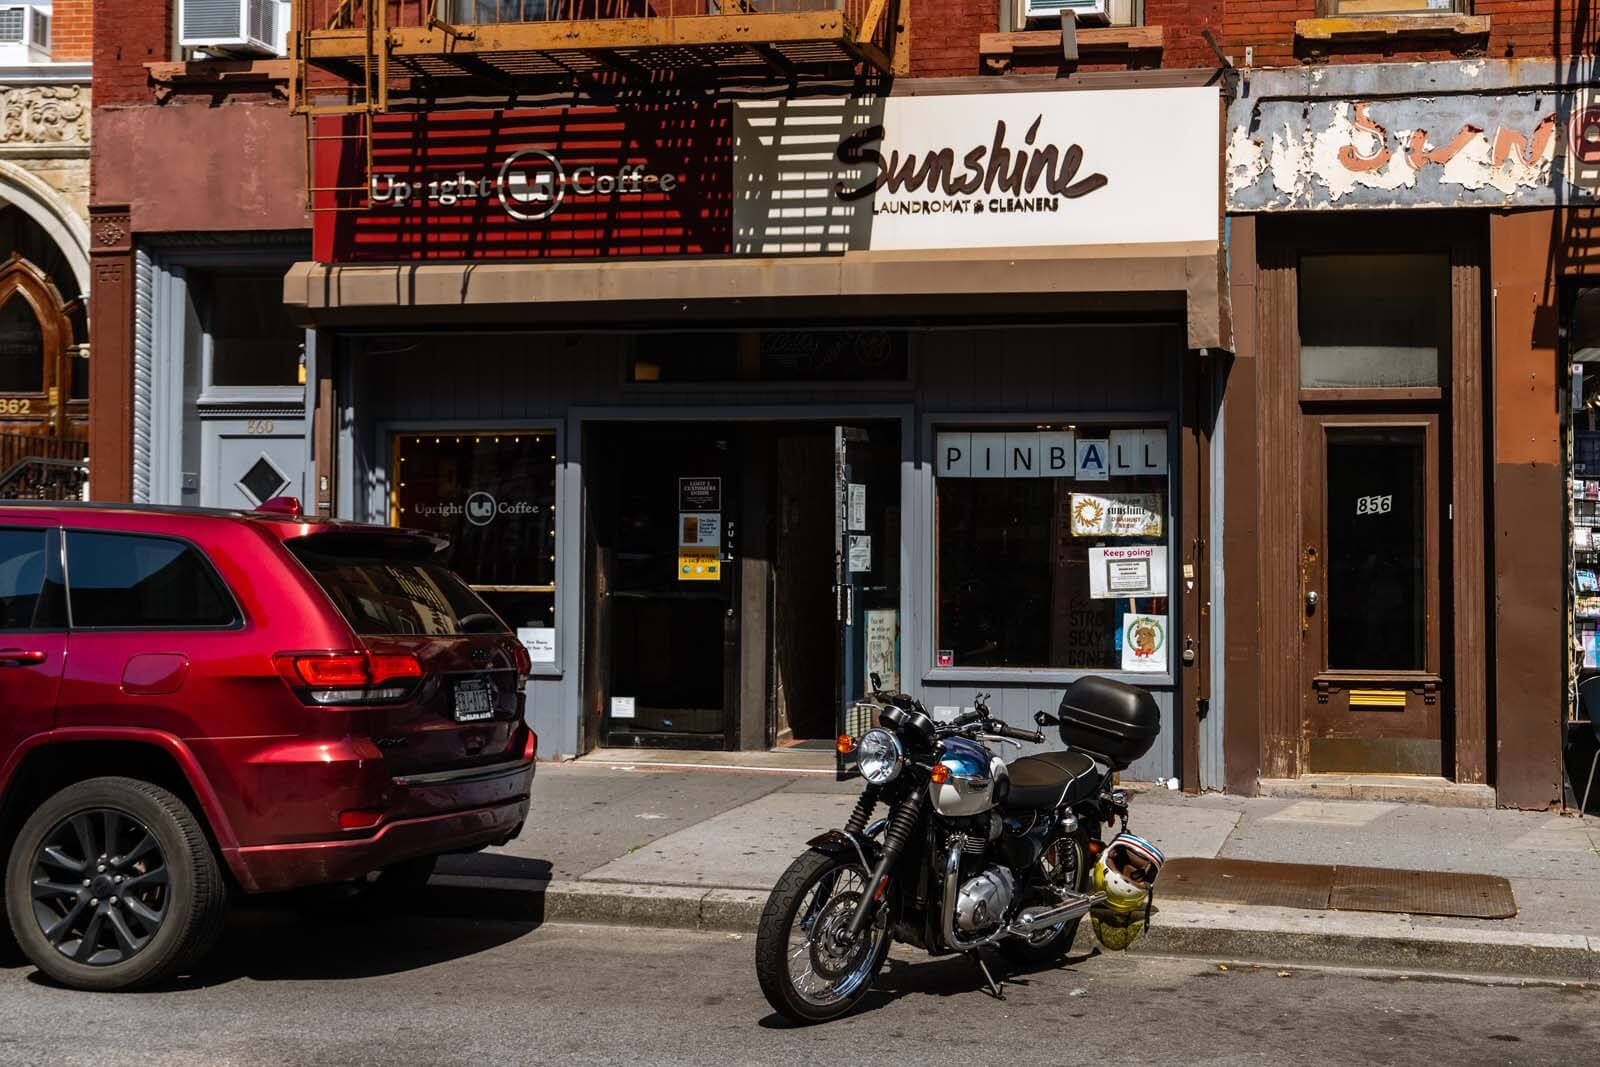 Sunshine Laundromat in Greenpoint Brooklyn